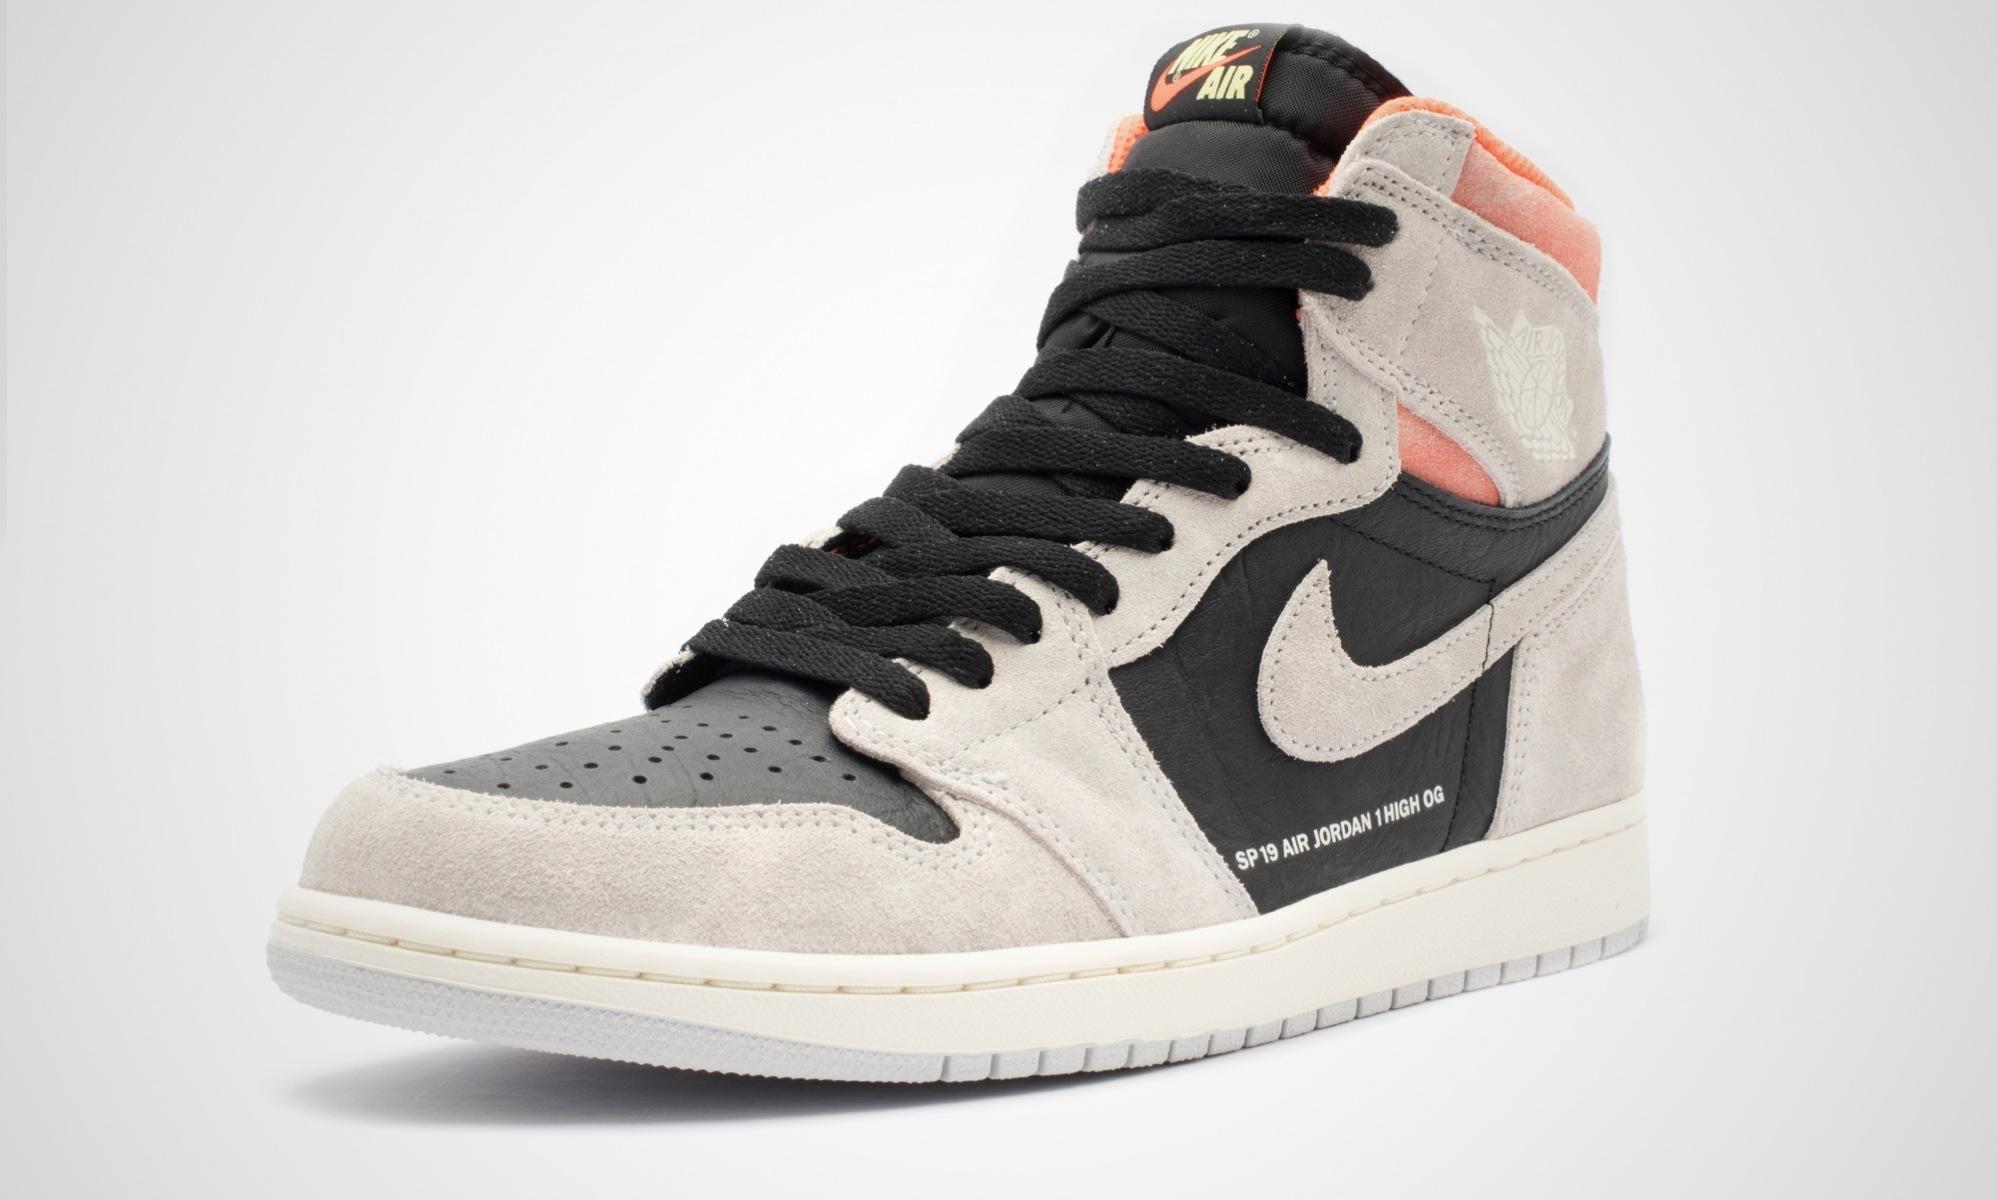 nike air jordan 1 hyper crimson dead stock sneakerblog